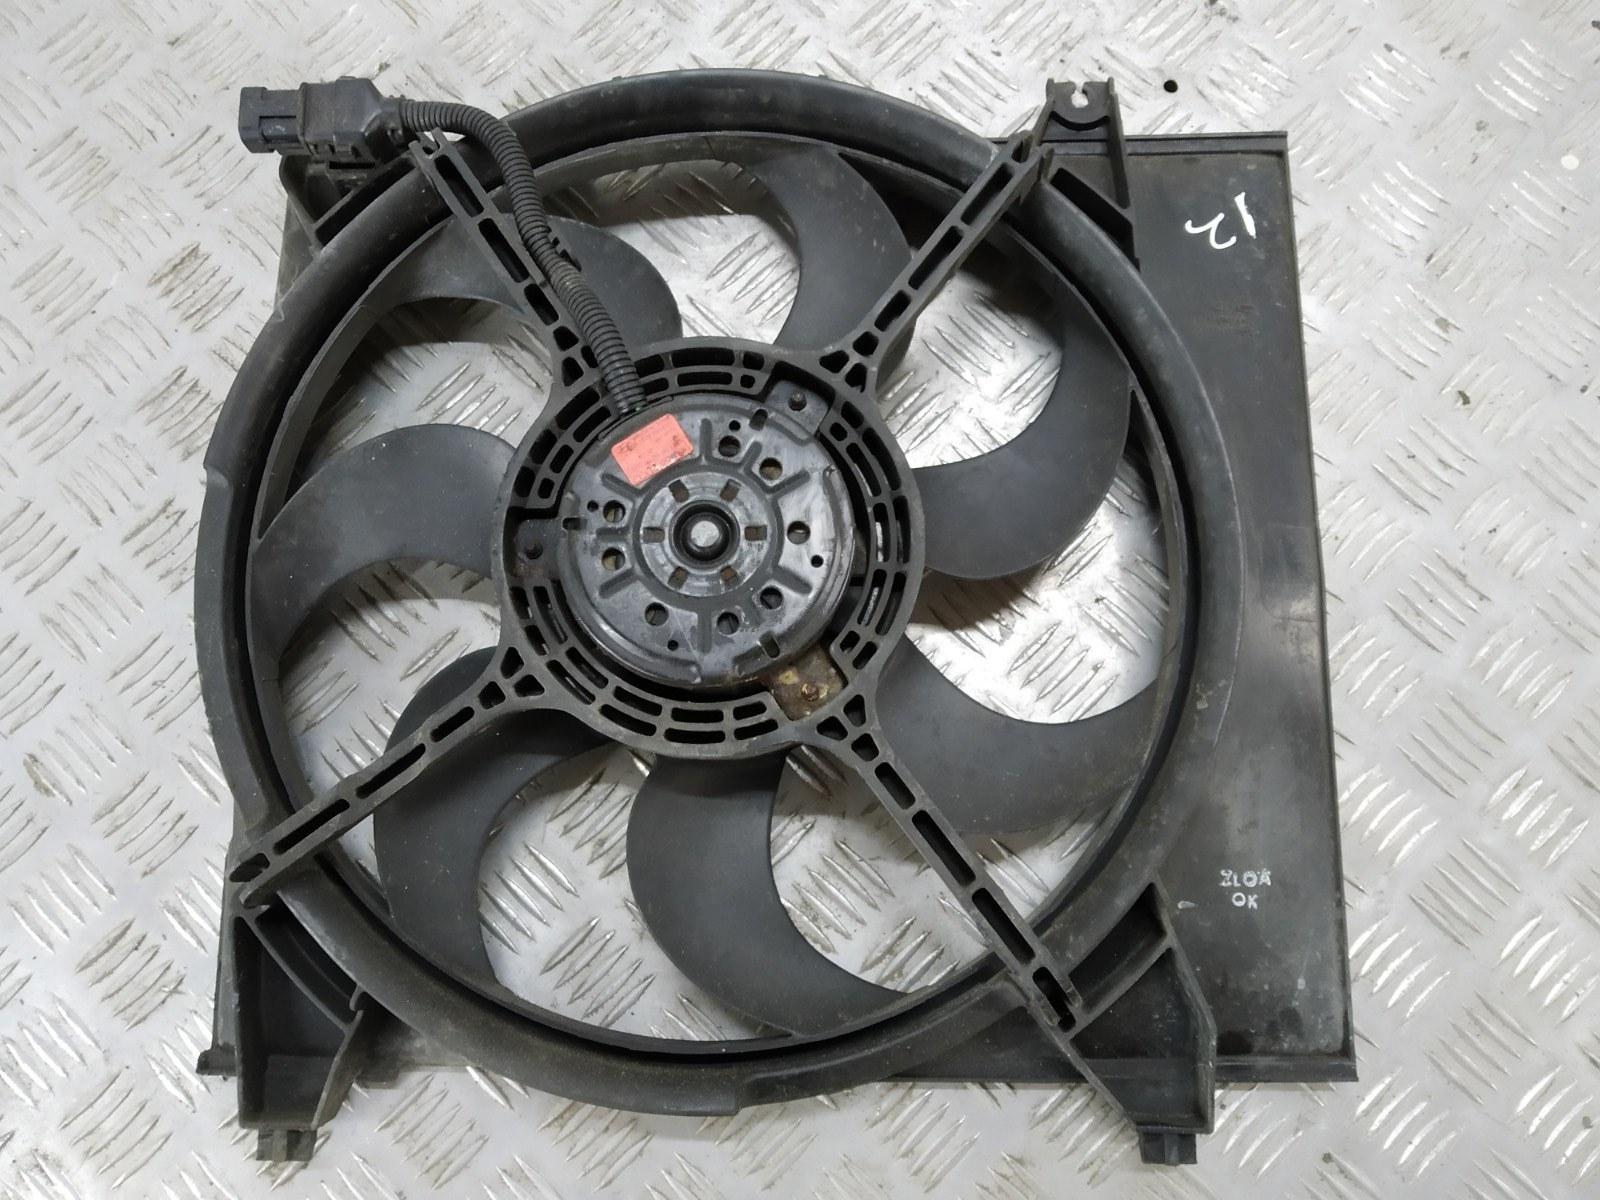 Вентилятор радиатора Hyundai Santa Fe 2.0 CRDI 2005 (б/у)